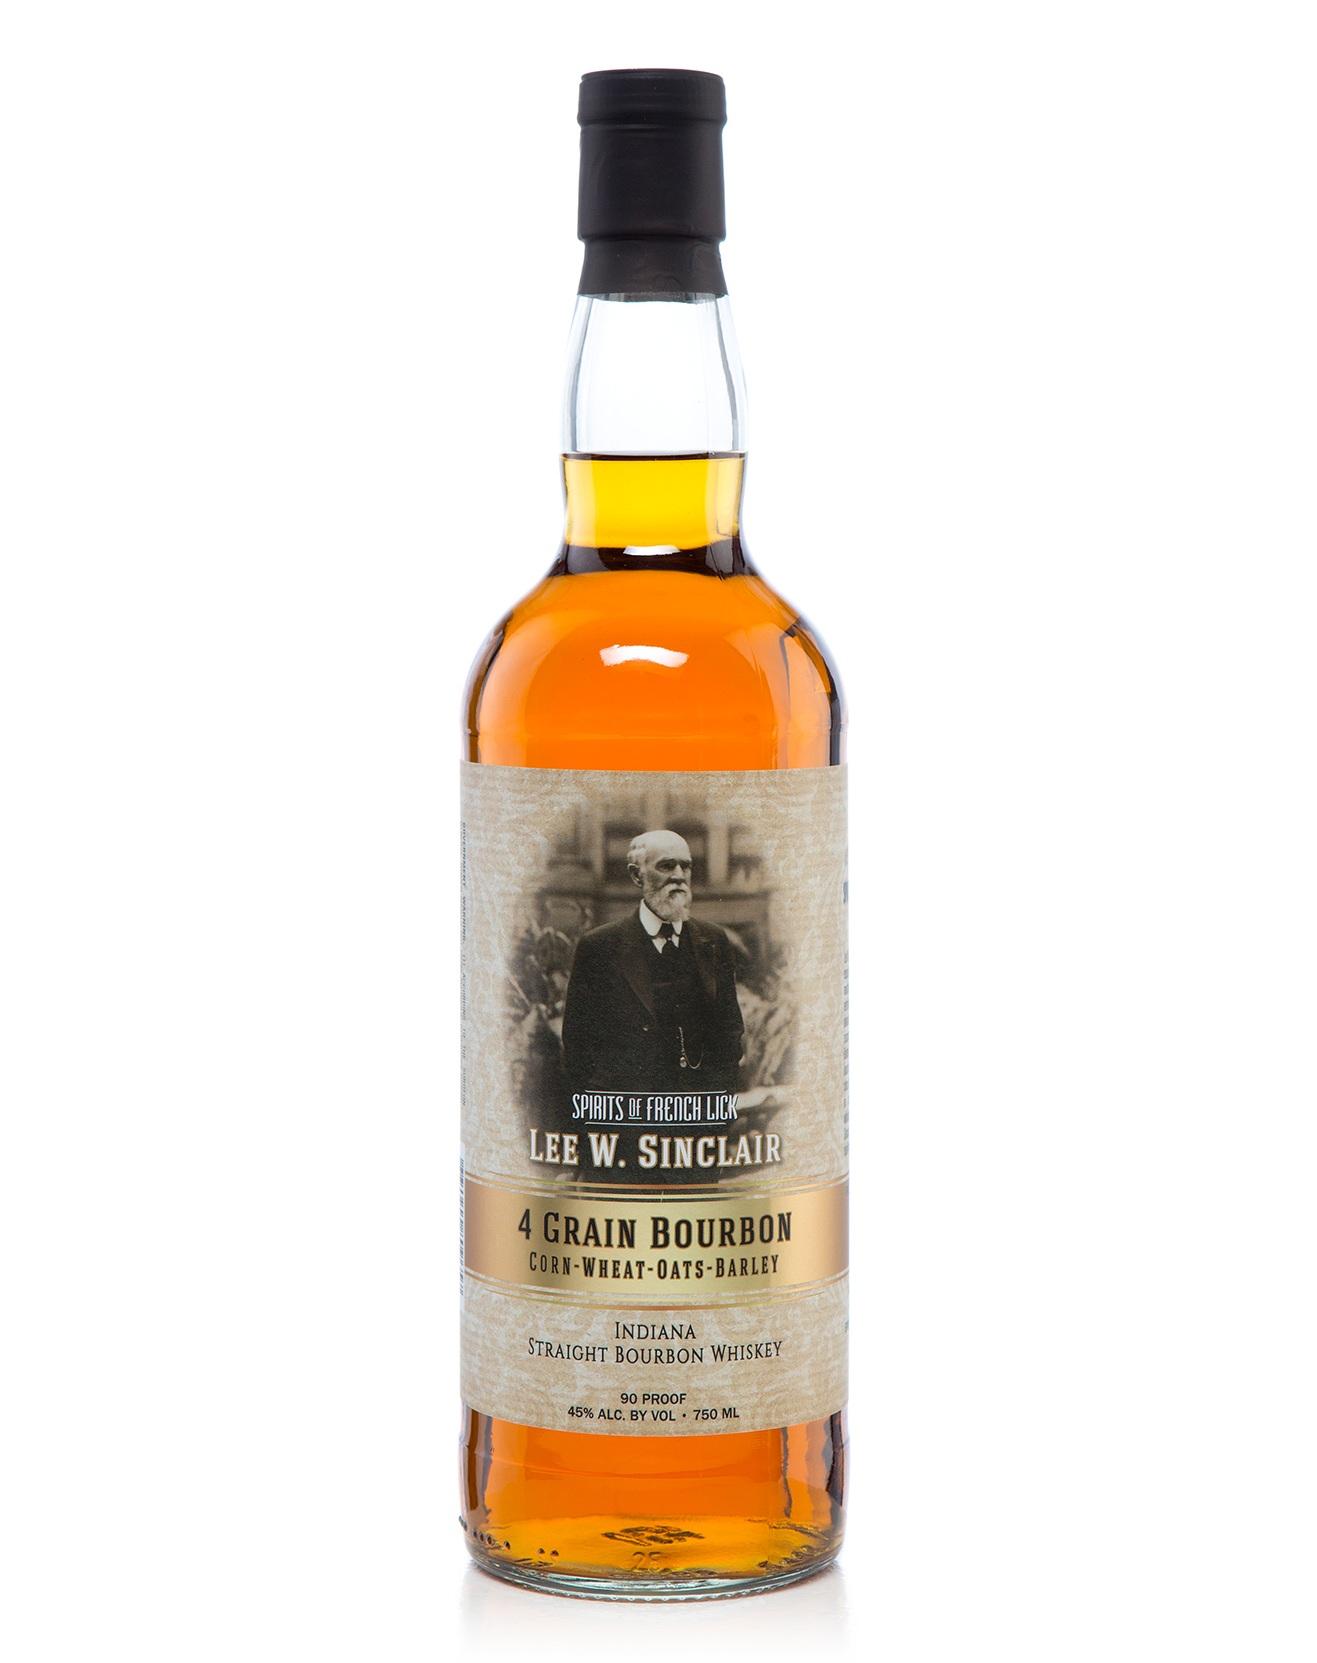 Spirits Of French Lick Lee Sinclair 4-Grain Bourbon